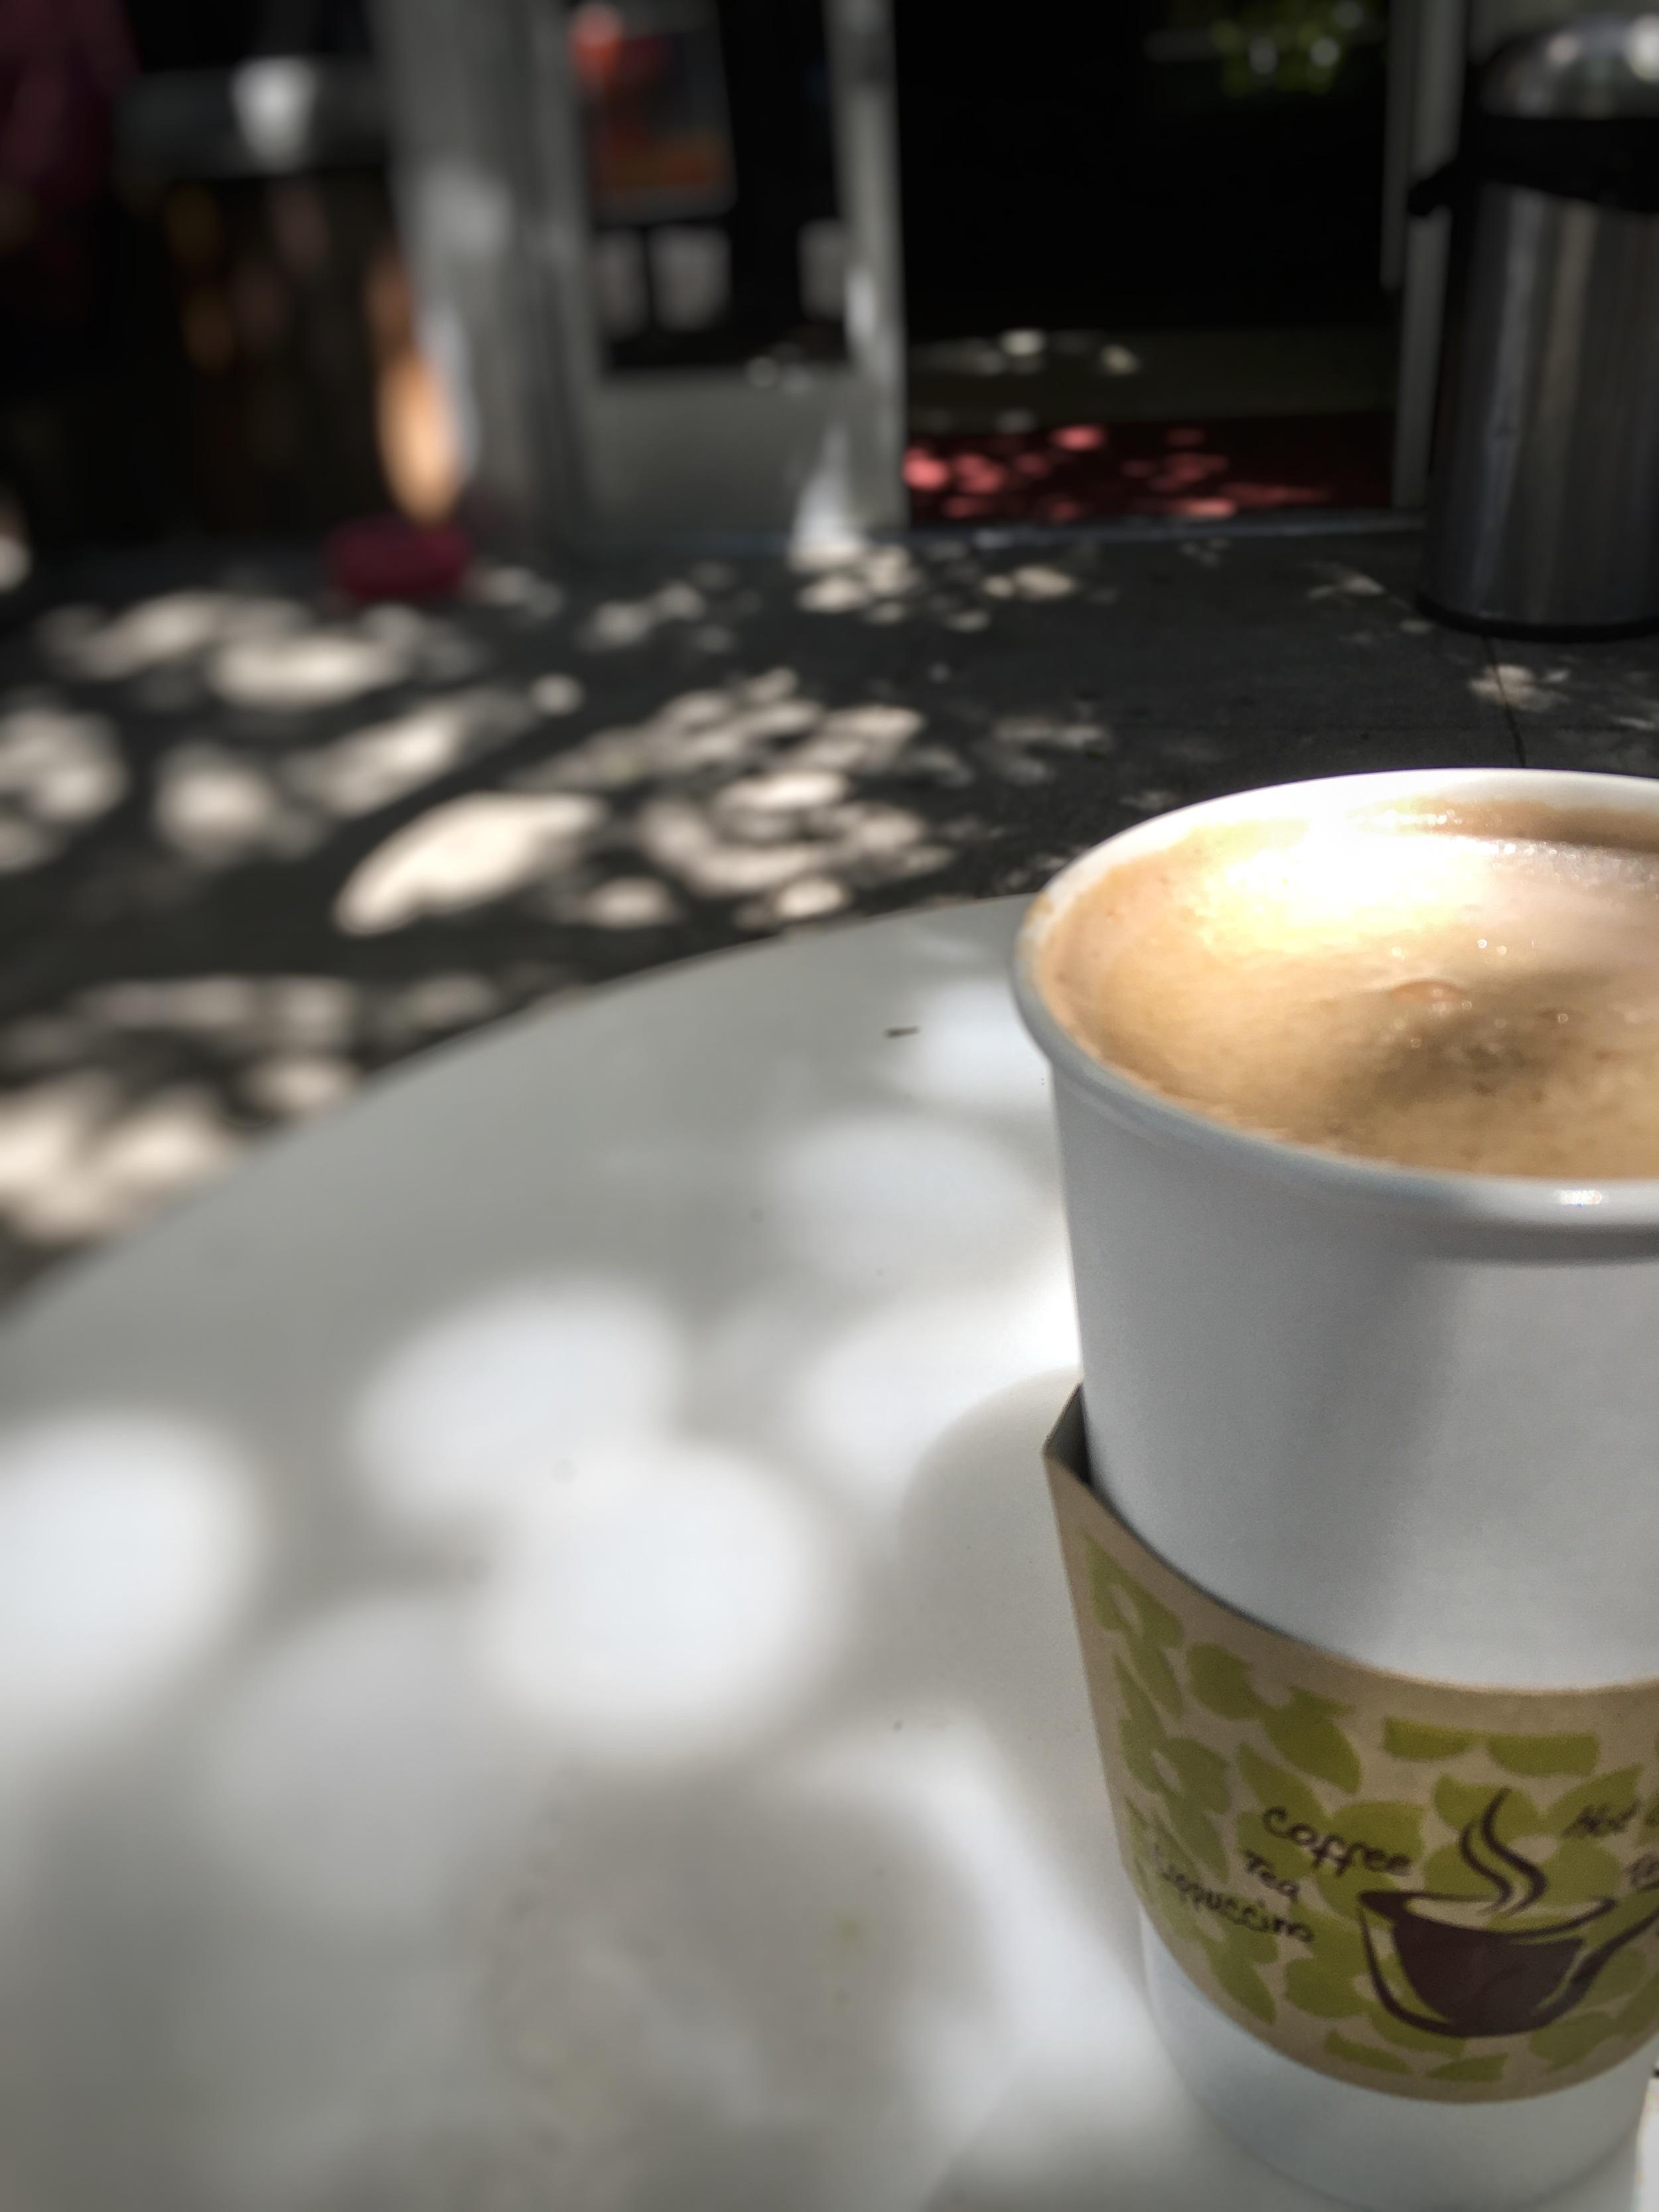 Caramel Mocha latte and beautiful weather in San Francisco!